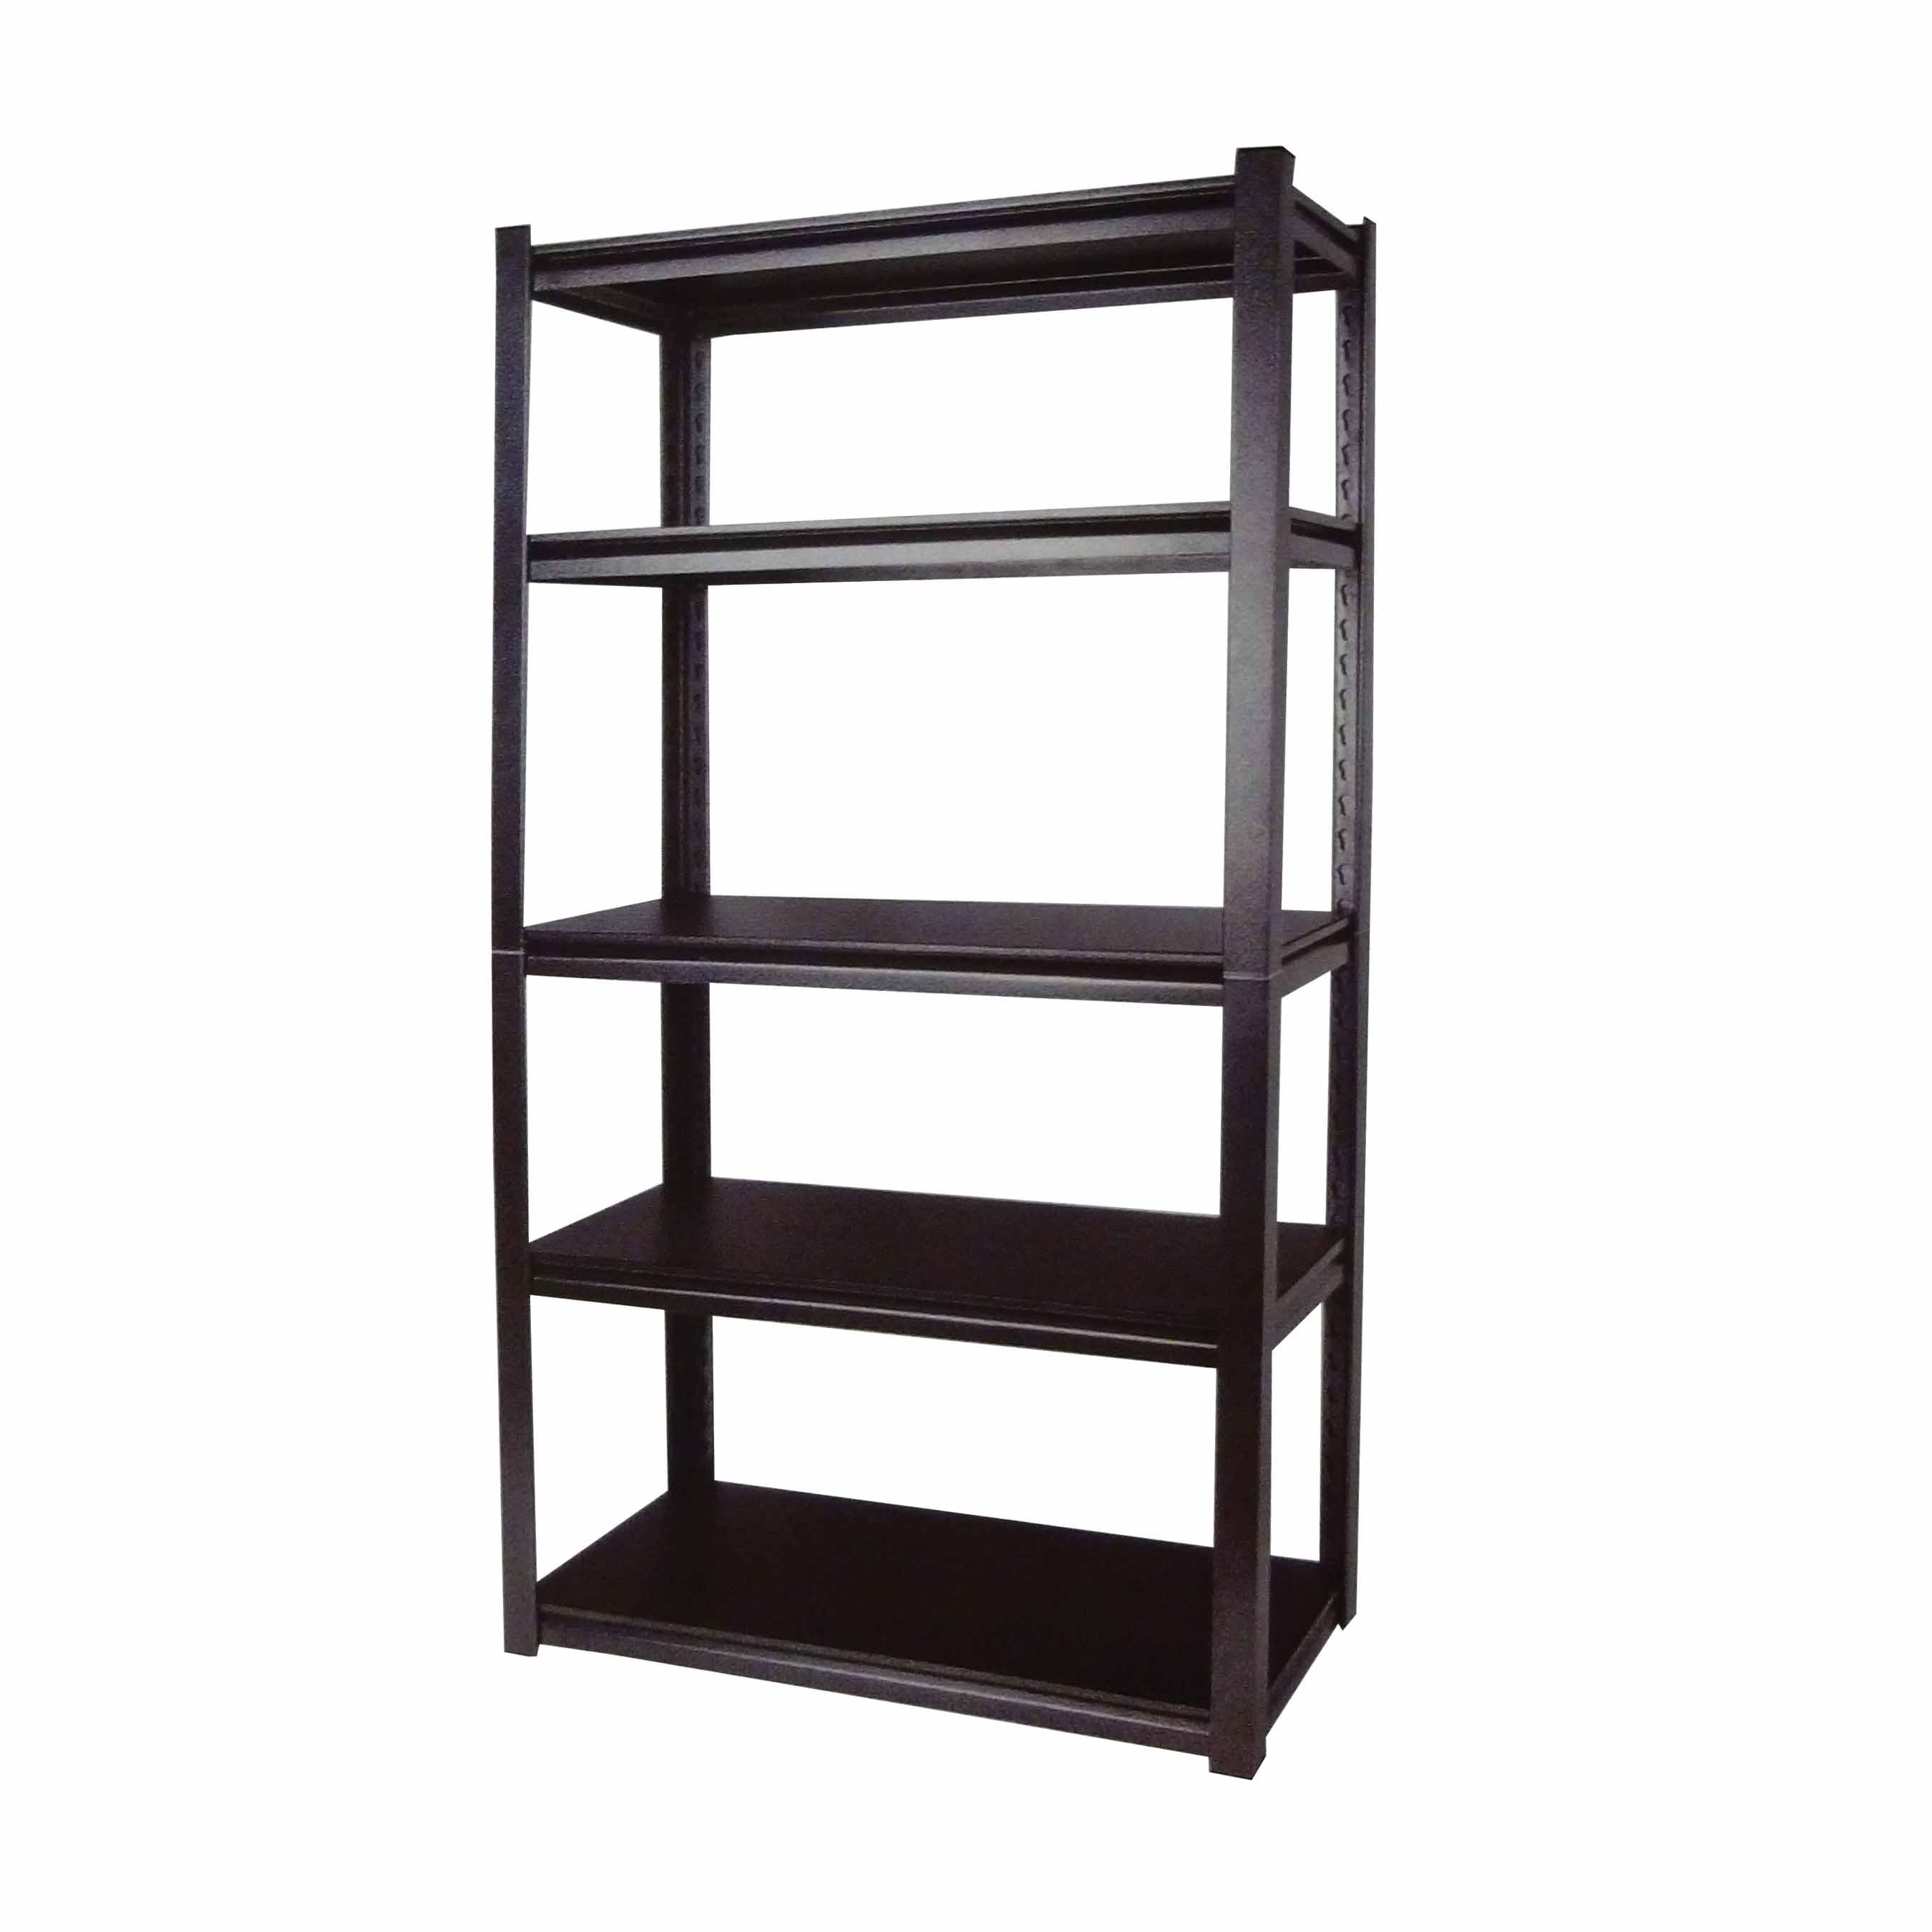 3 niveles, 60 x 35 x 66 cm Estanter/ía de metal resistente para garaje Plasaig